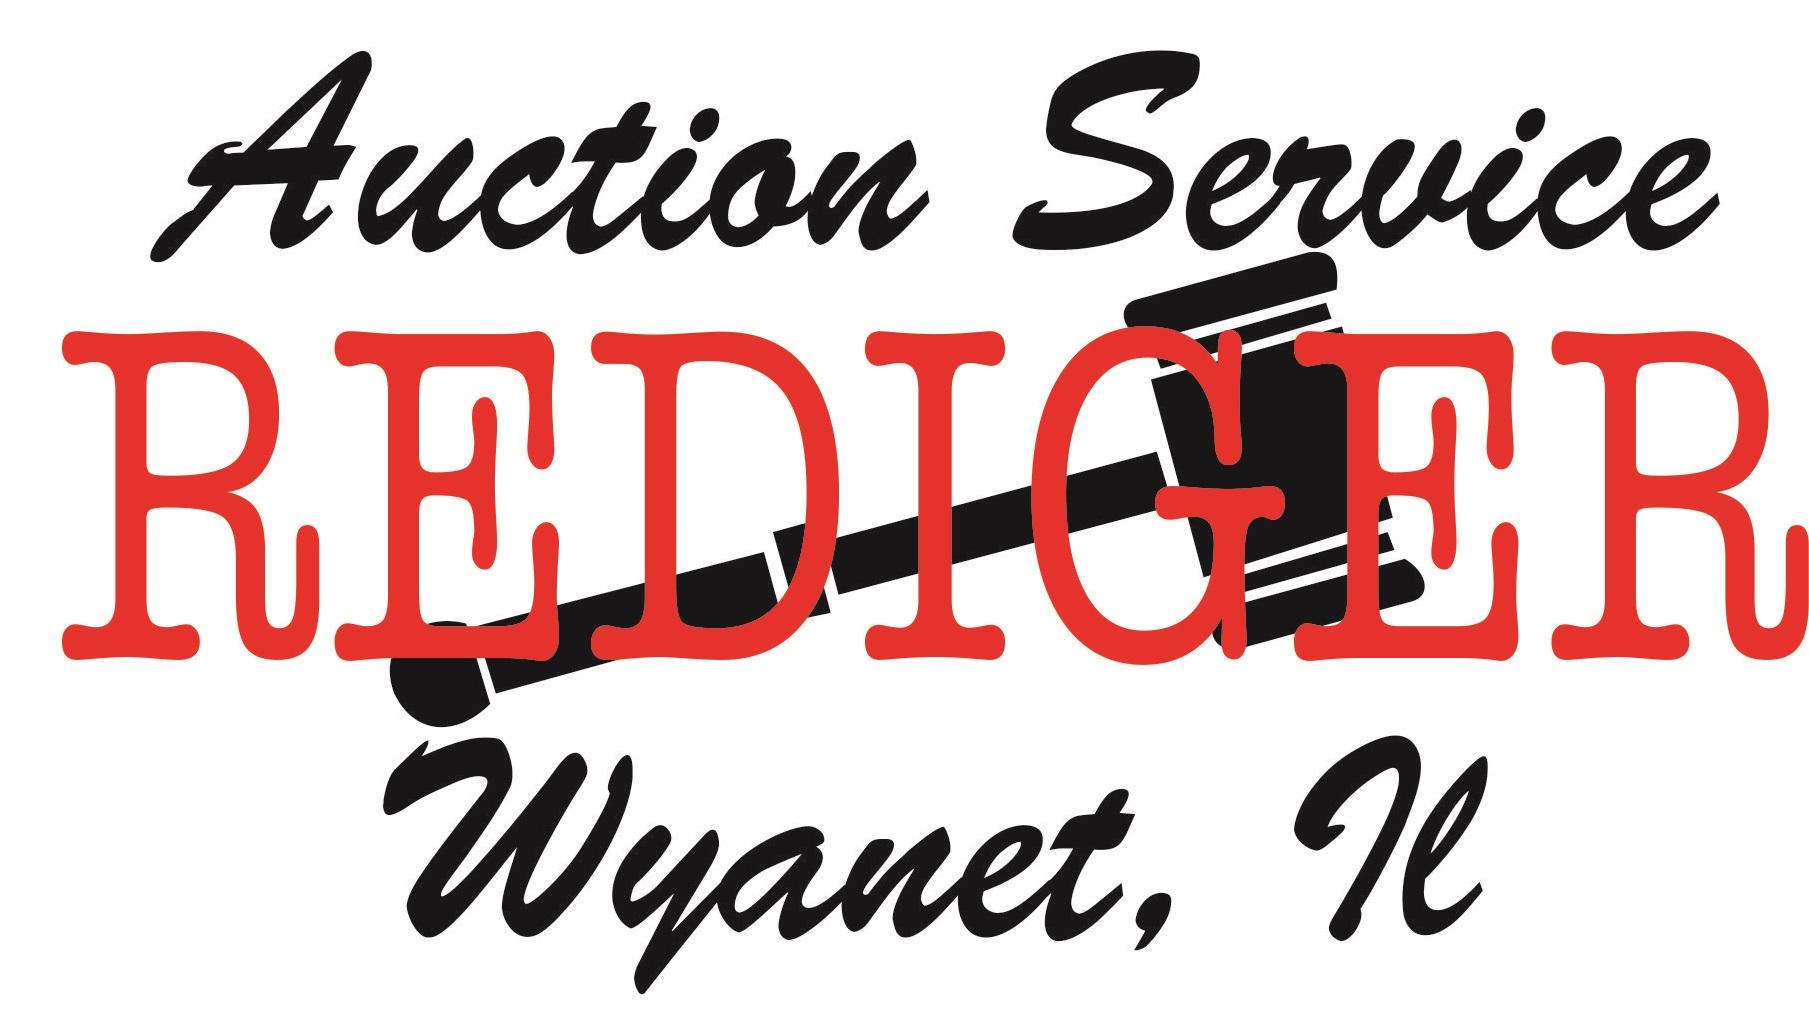 Rediger Auction Service